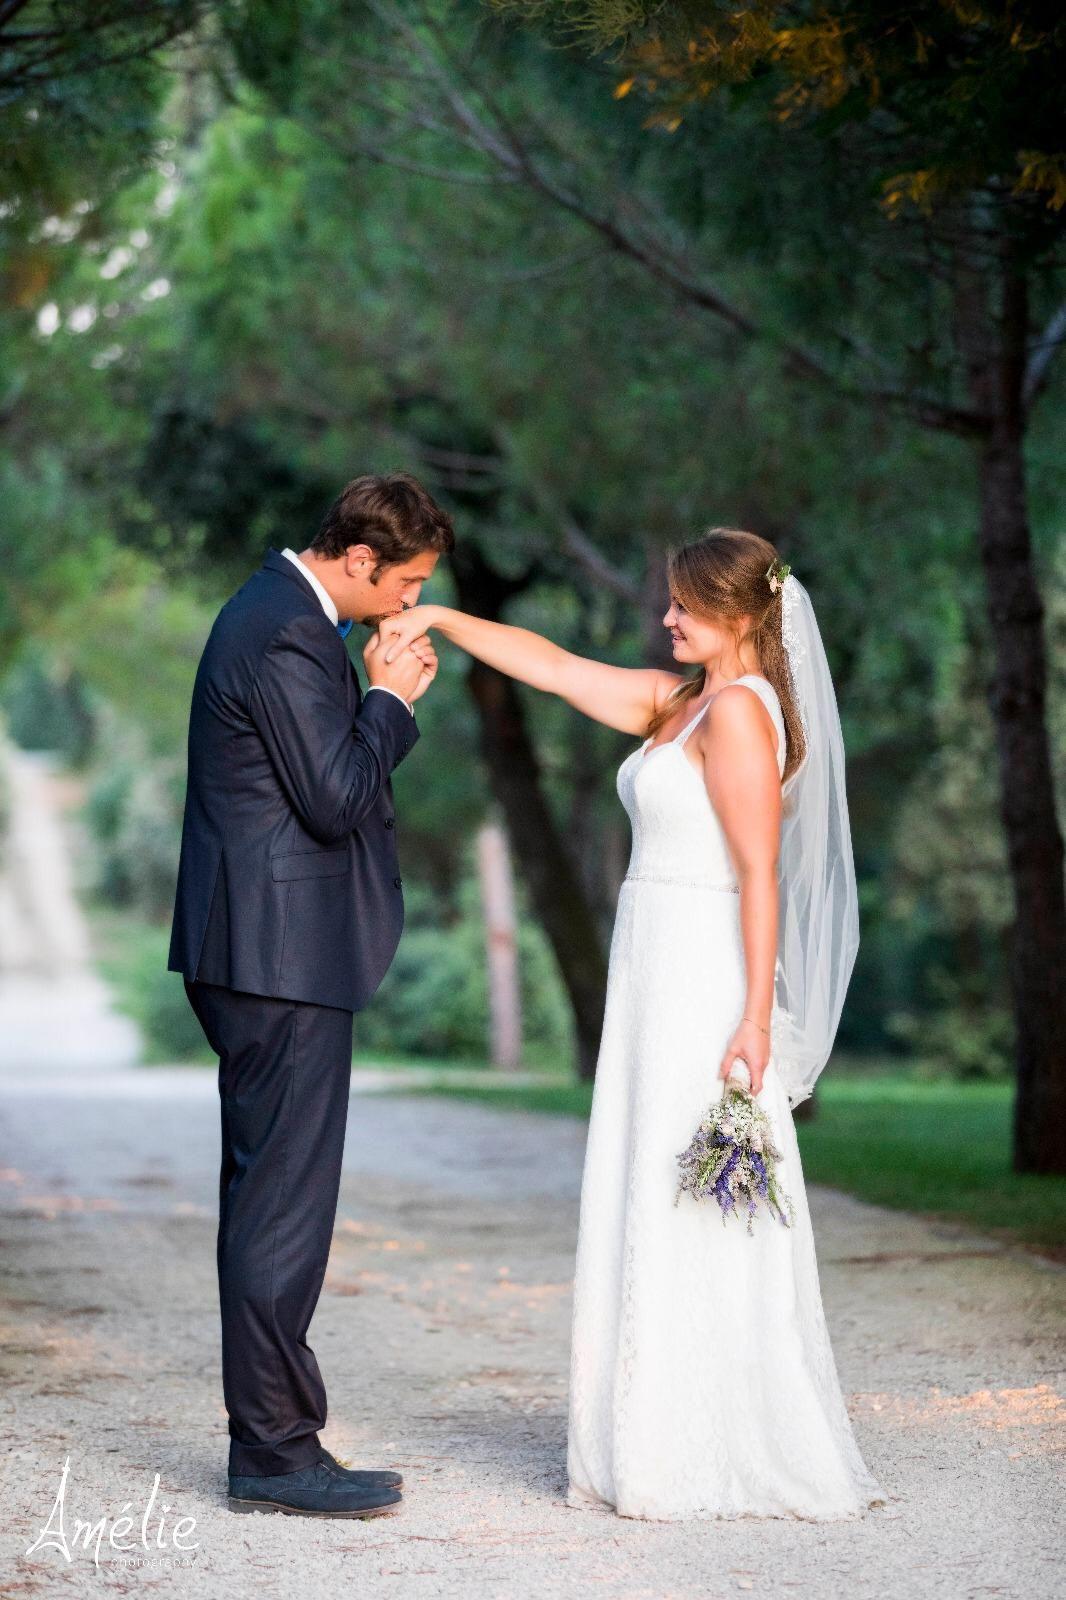 Rovinj wedding organizer W² - Rovinj 2018 - Kristin and Marcus testimonial - Amélie Photography